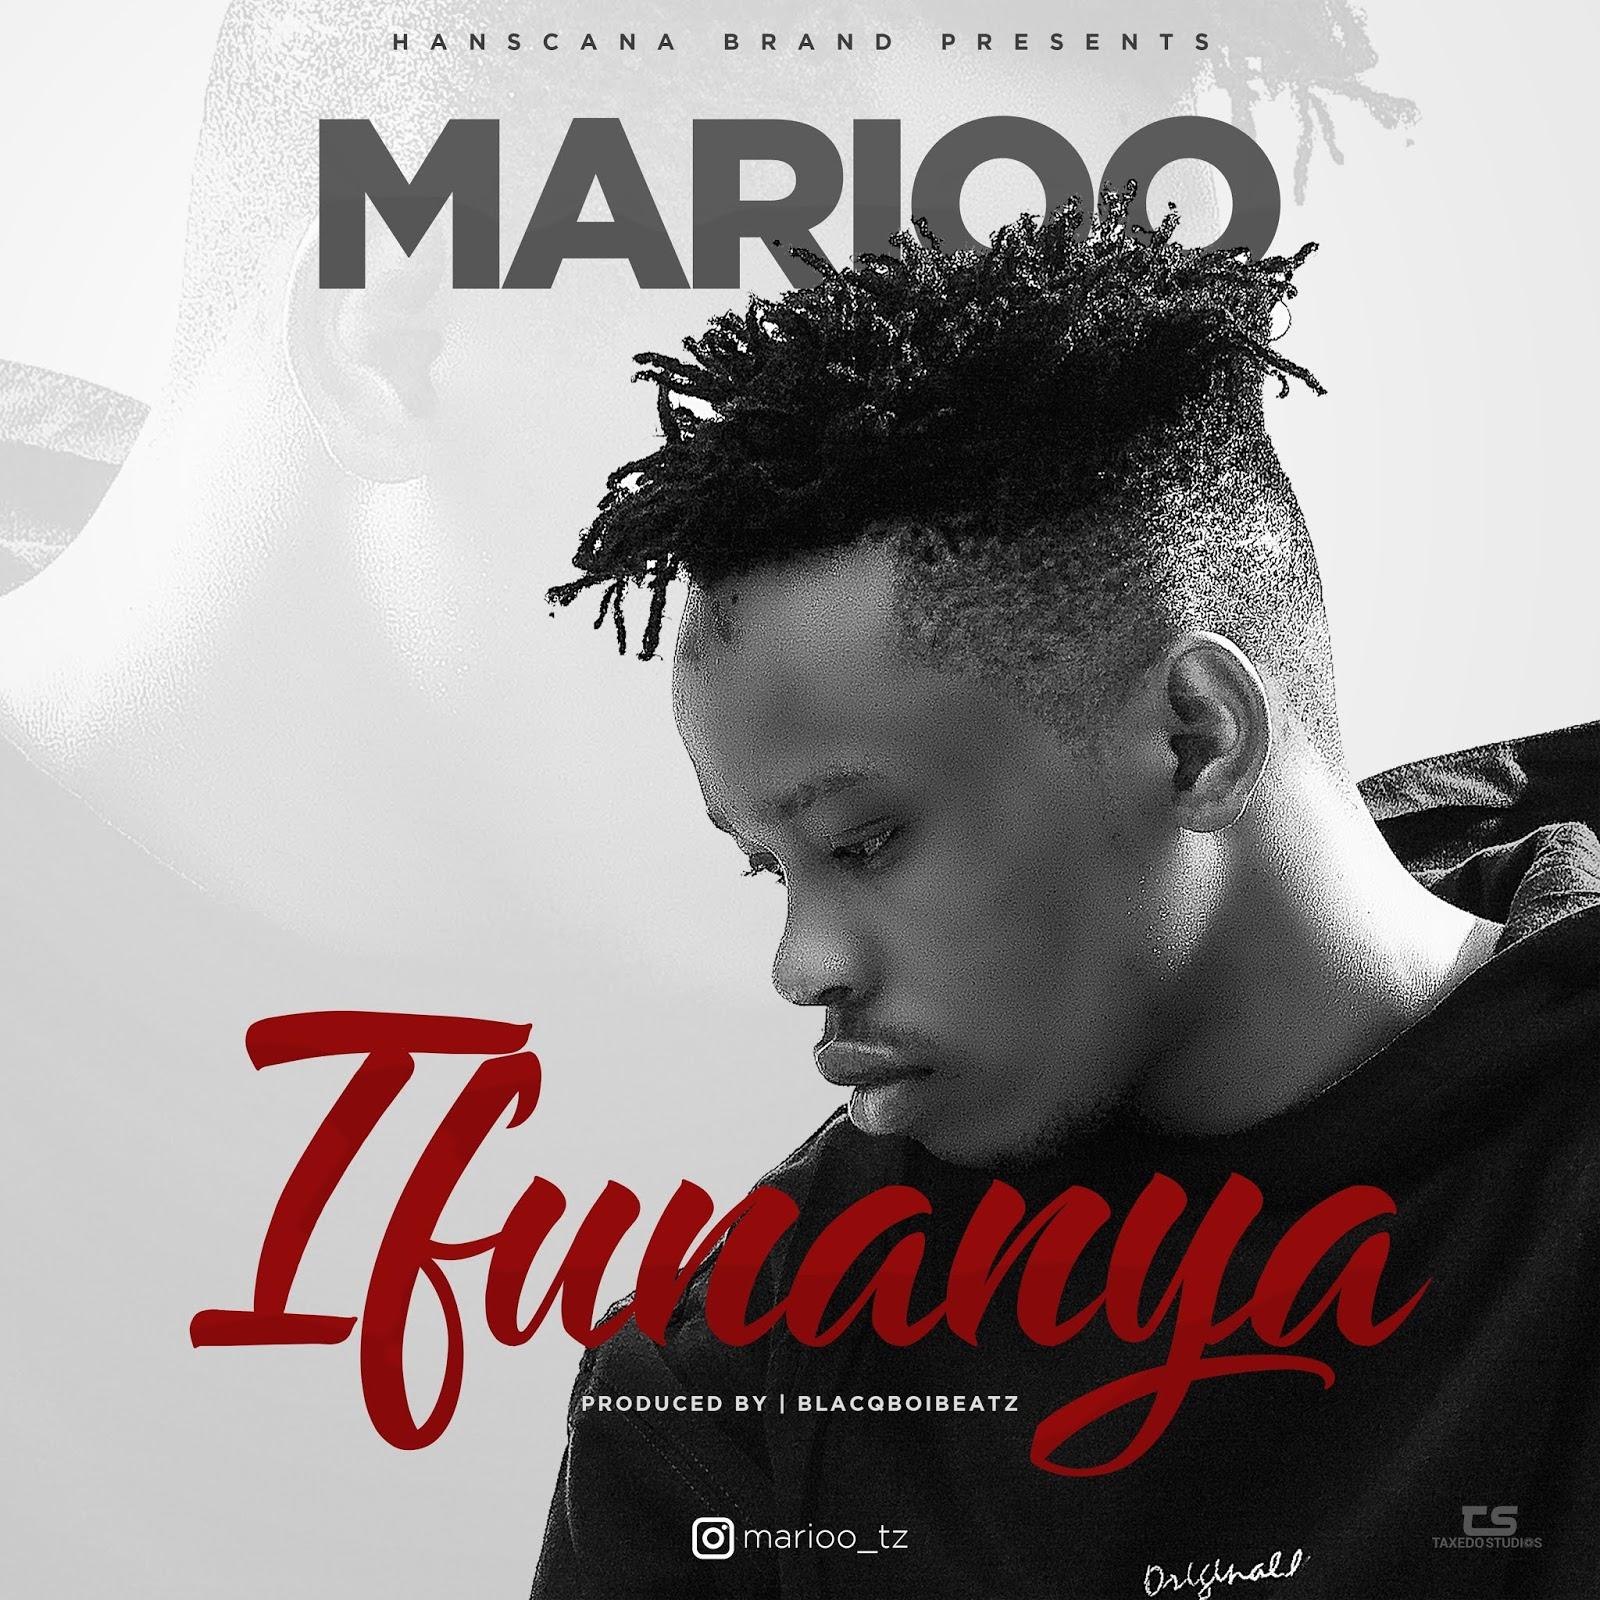 Dj Mwanga Marioo New Song / Peopleforcarlandrews